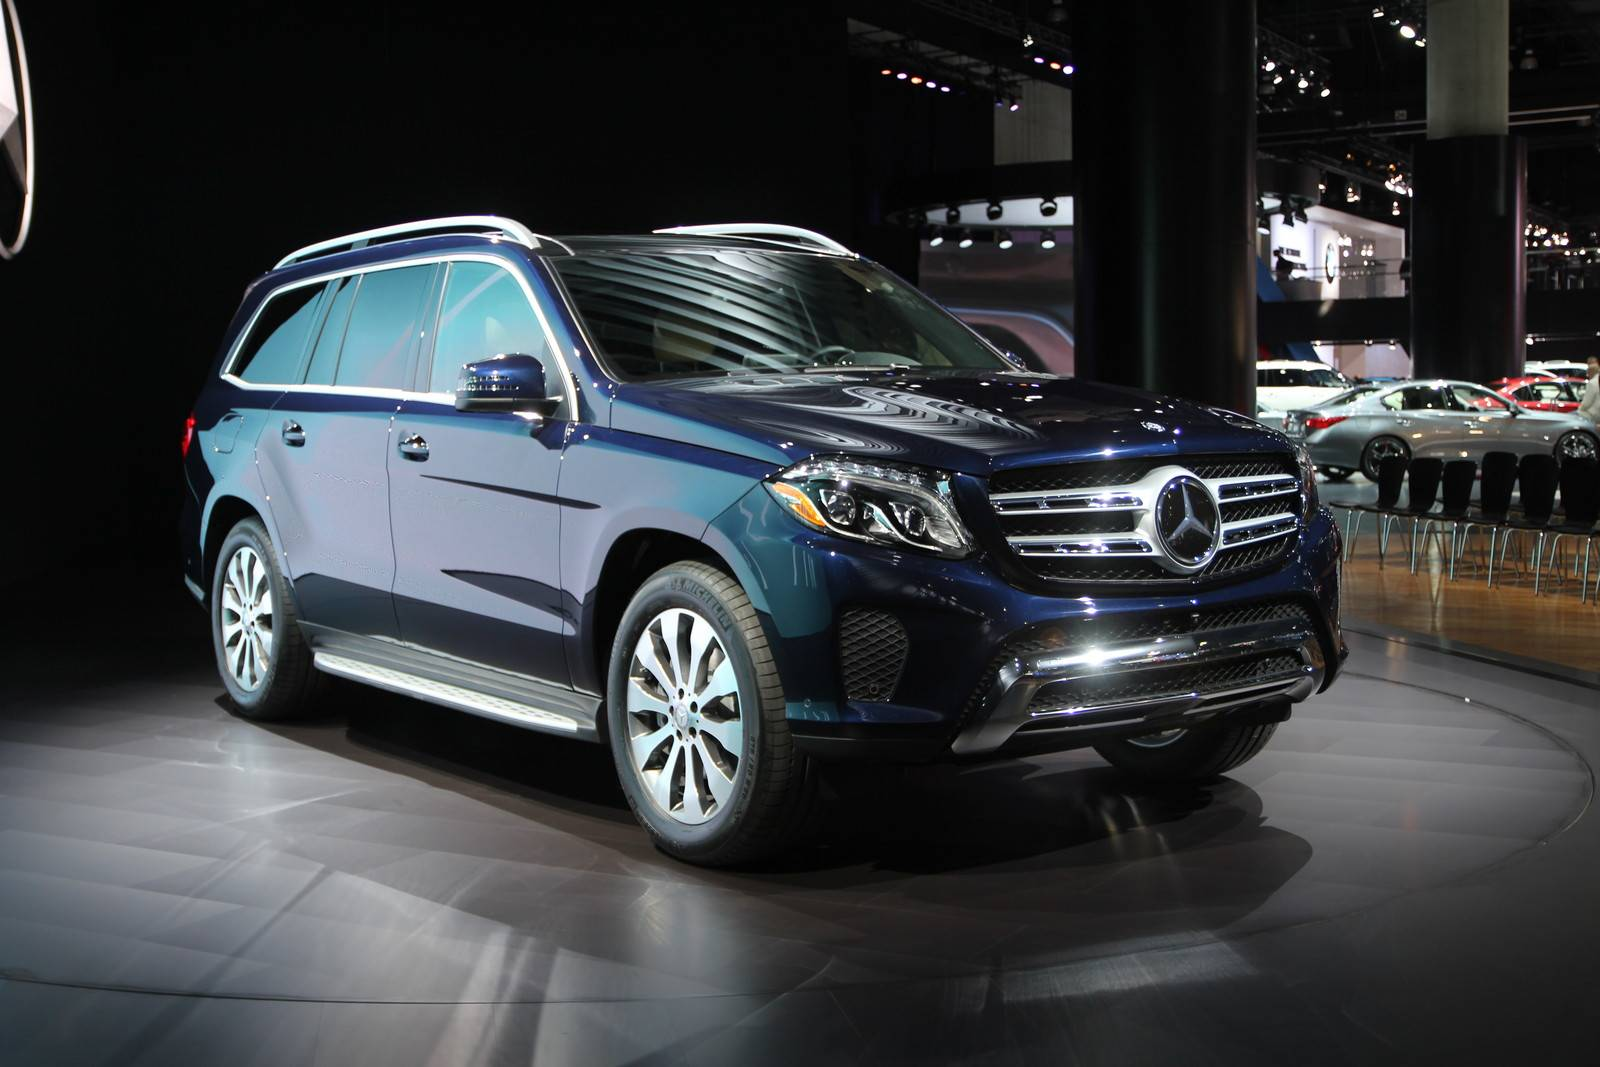 Los angeles 2015 mercedes benz gls gtspirit for Mercedes benz gls